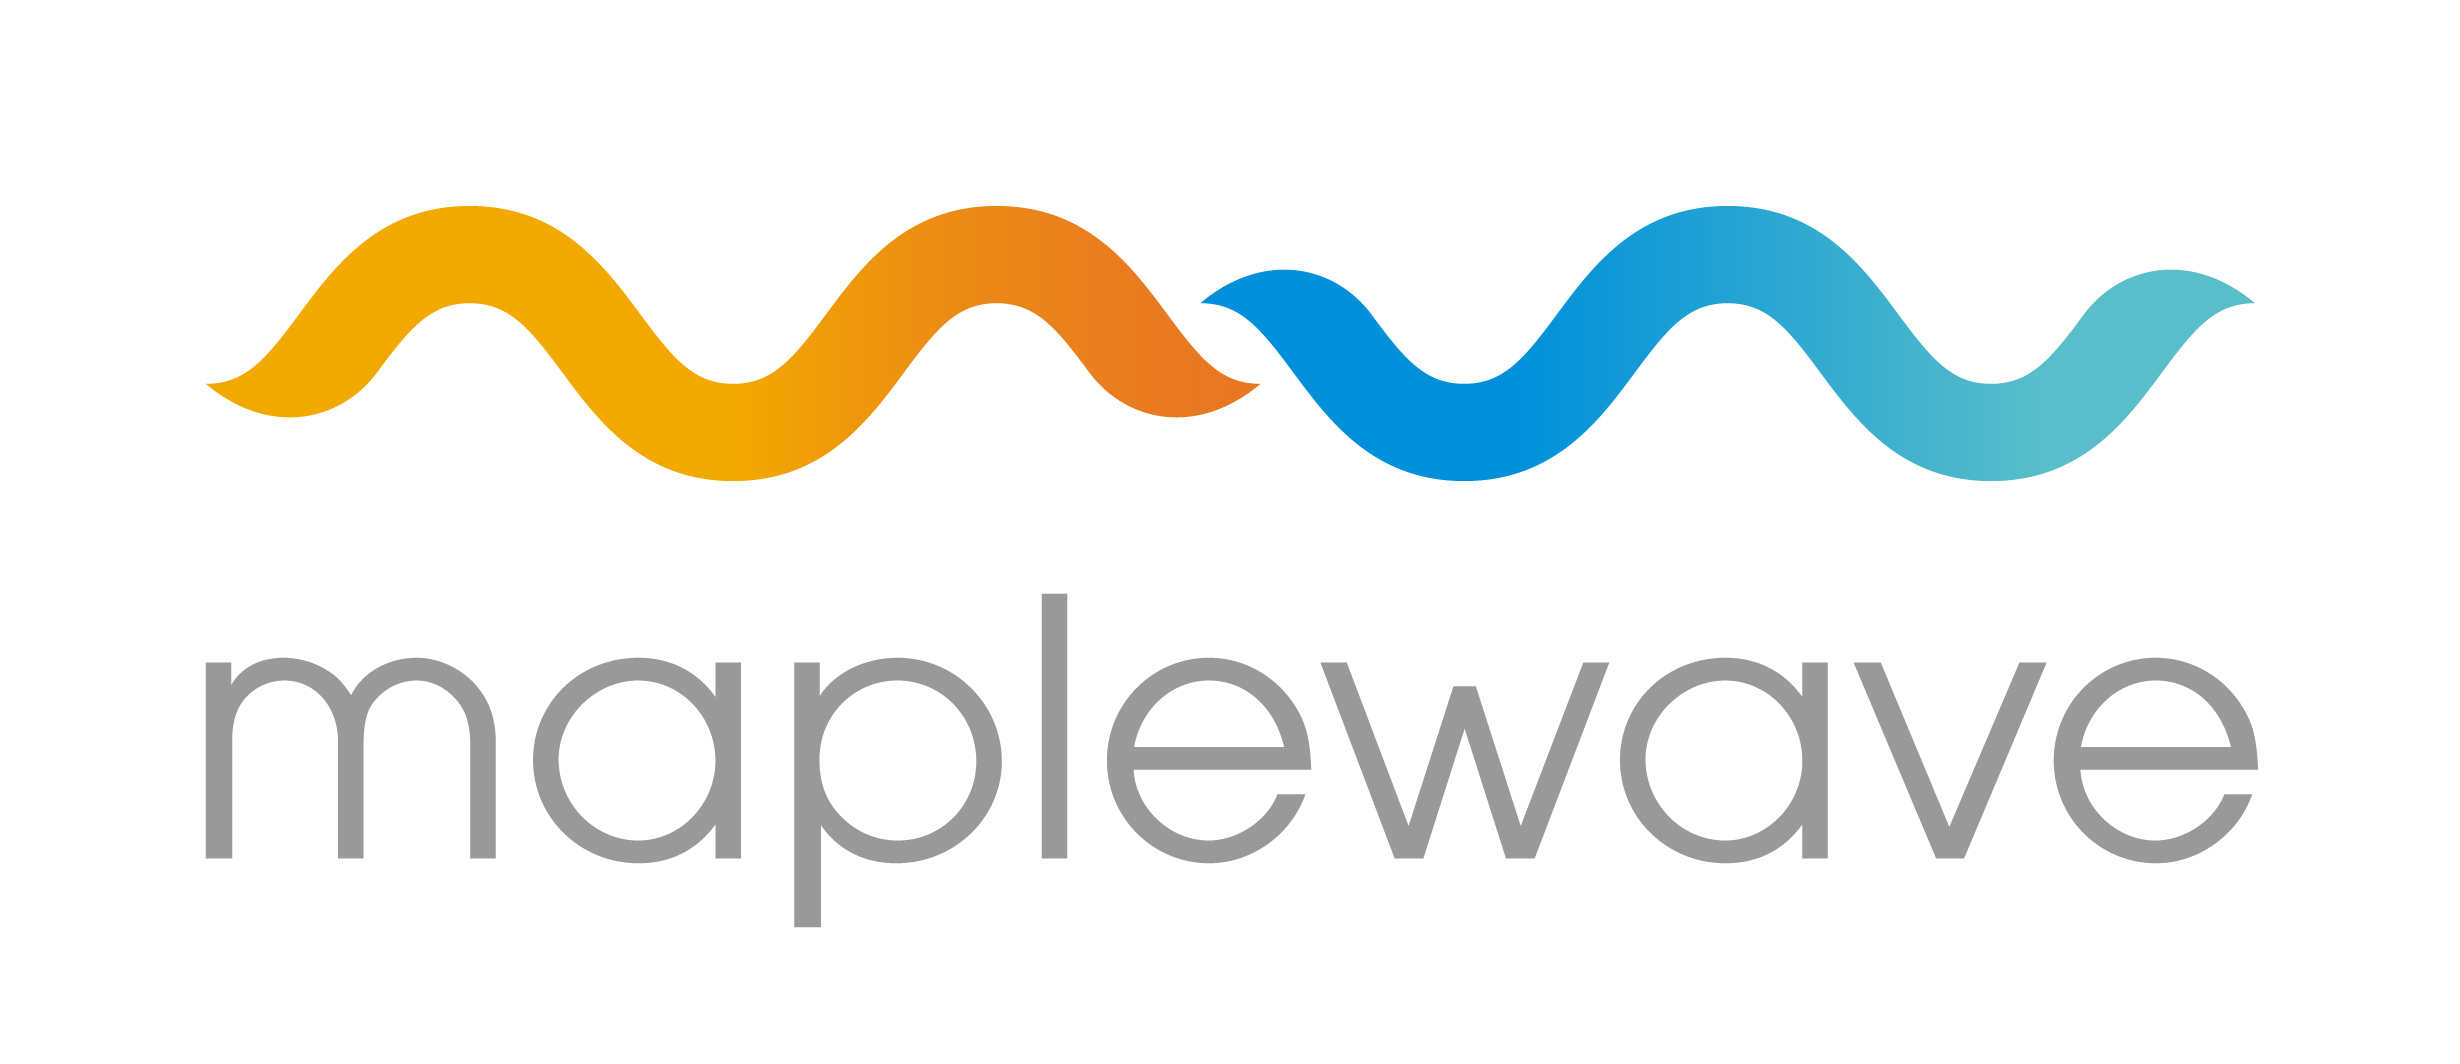 Maplewave Logo